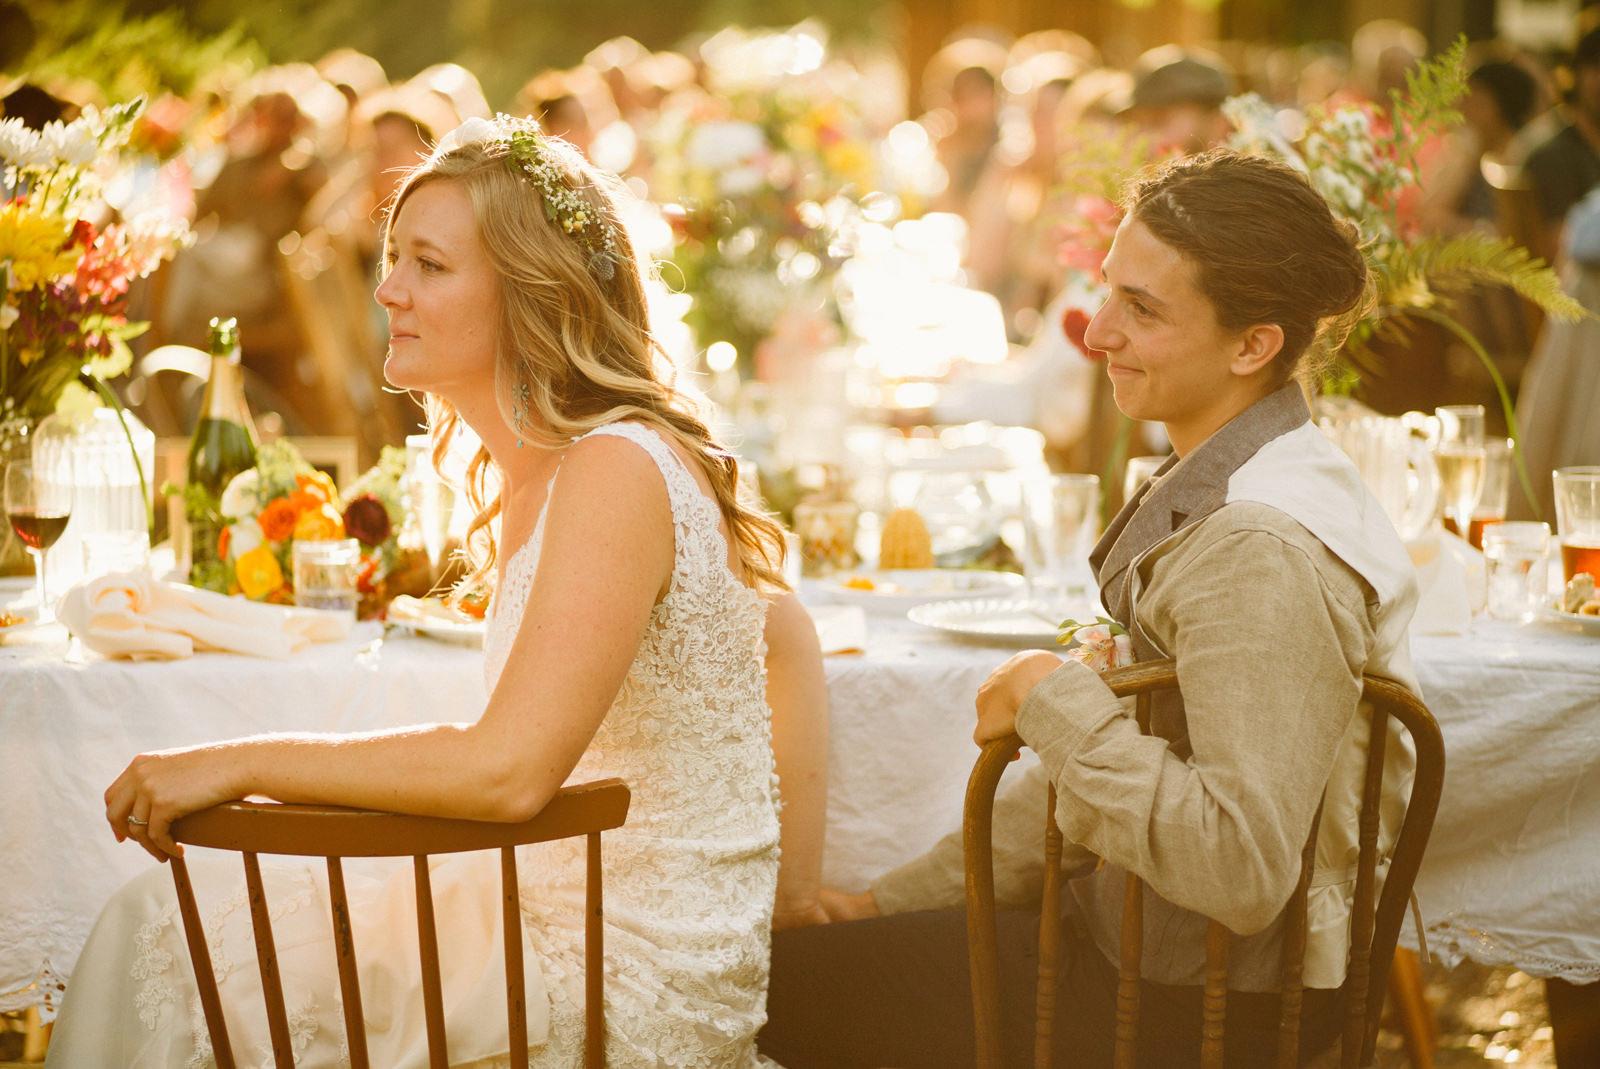 rivers-bend-retreat-wedding-084 RIVER'S BEND RETREAT WEDDING